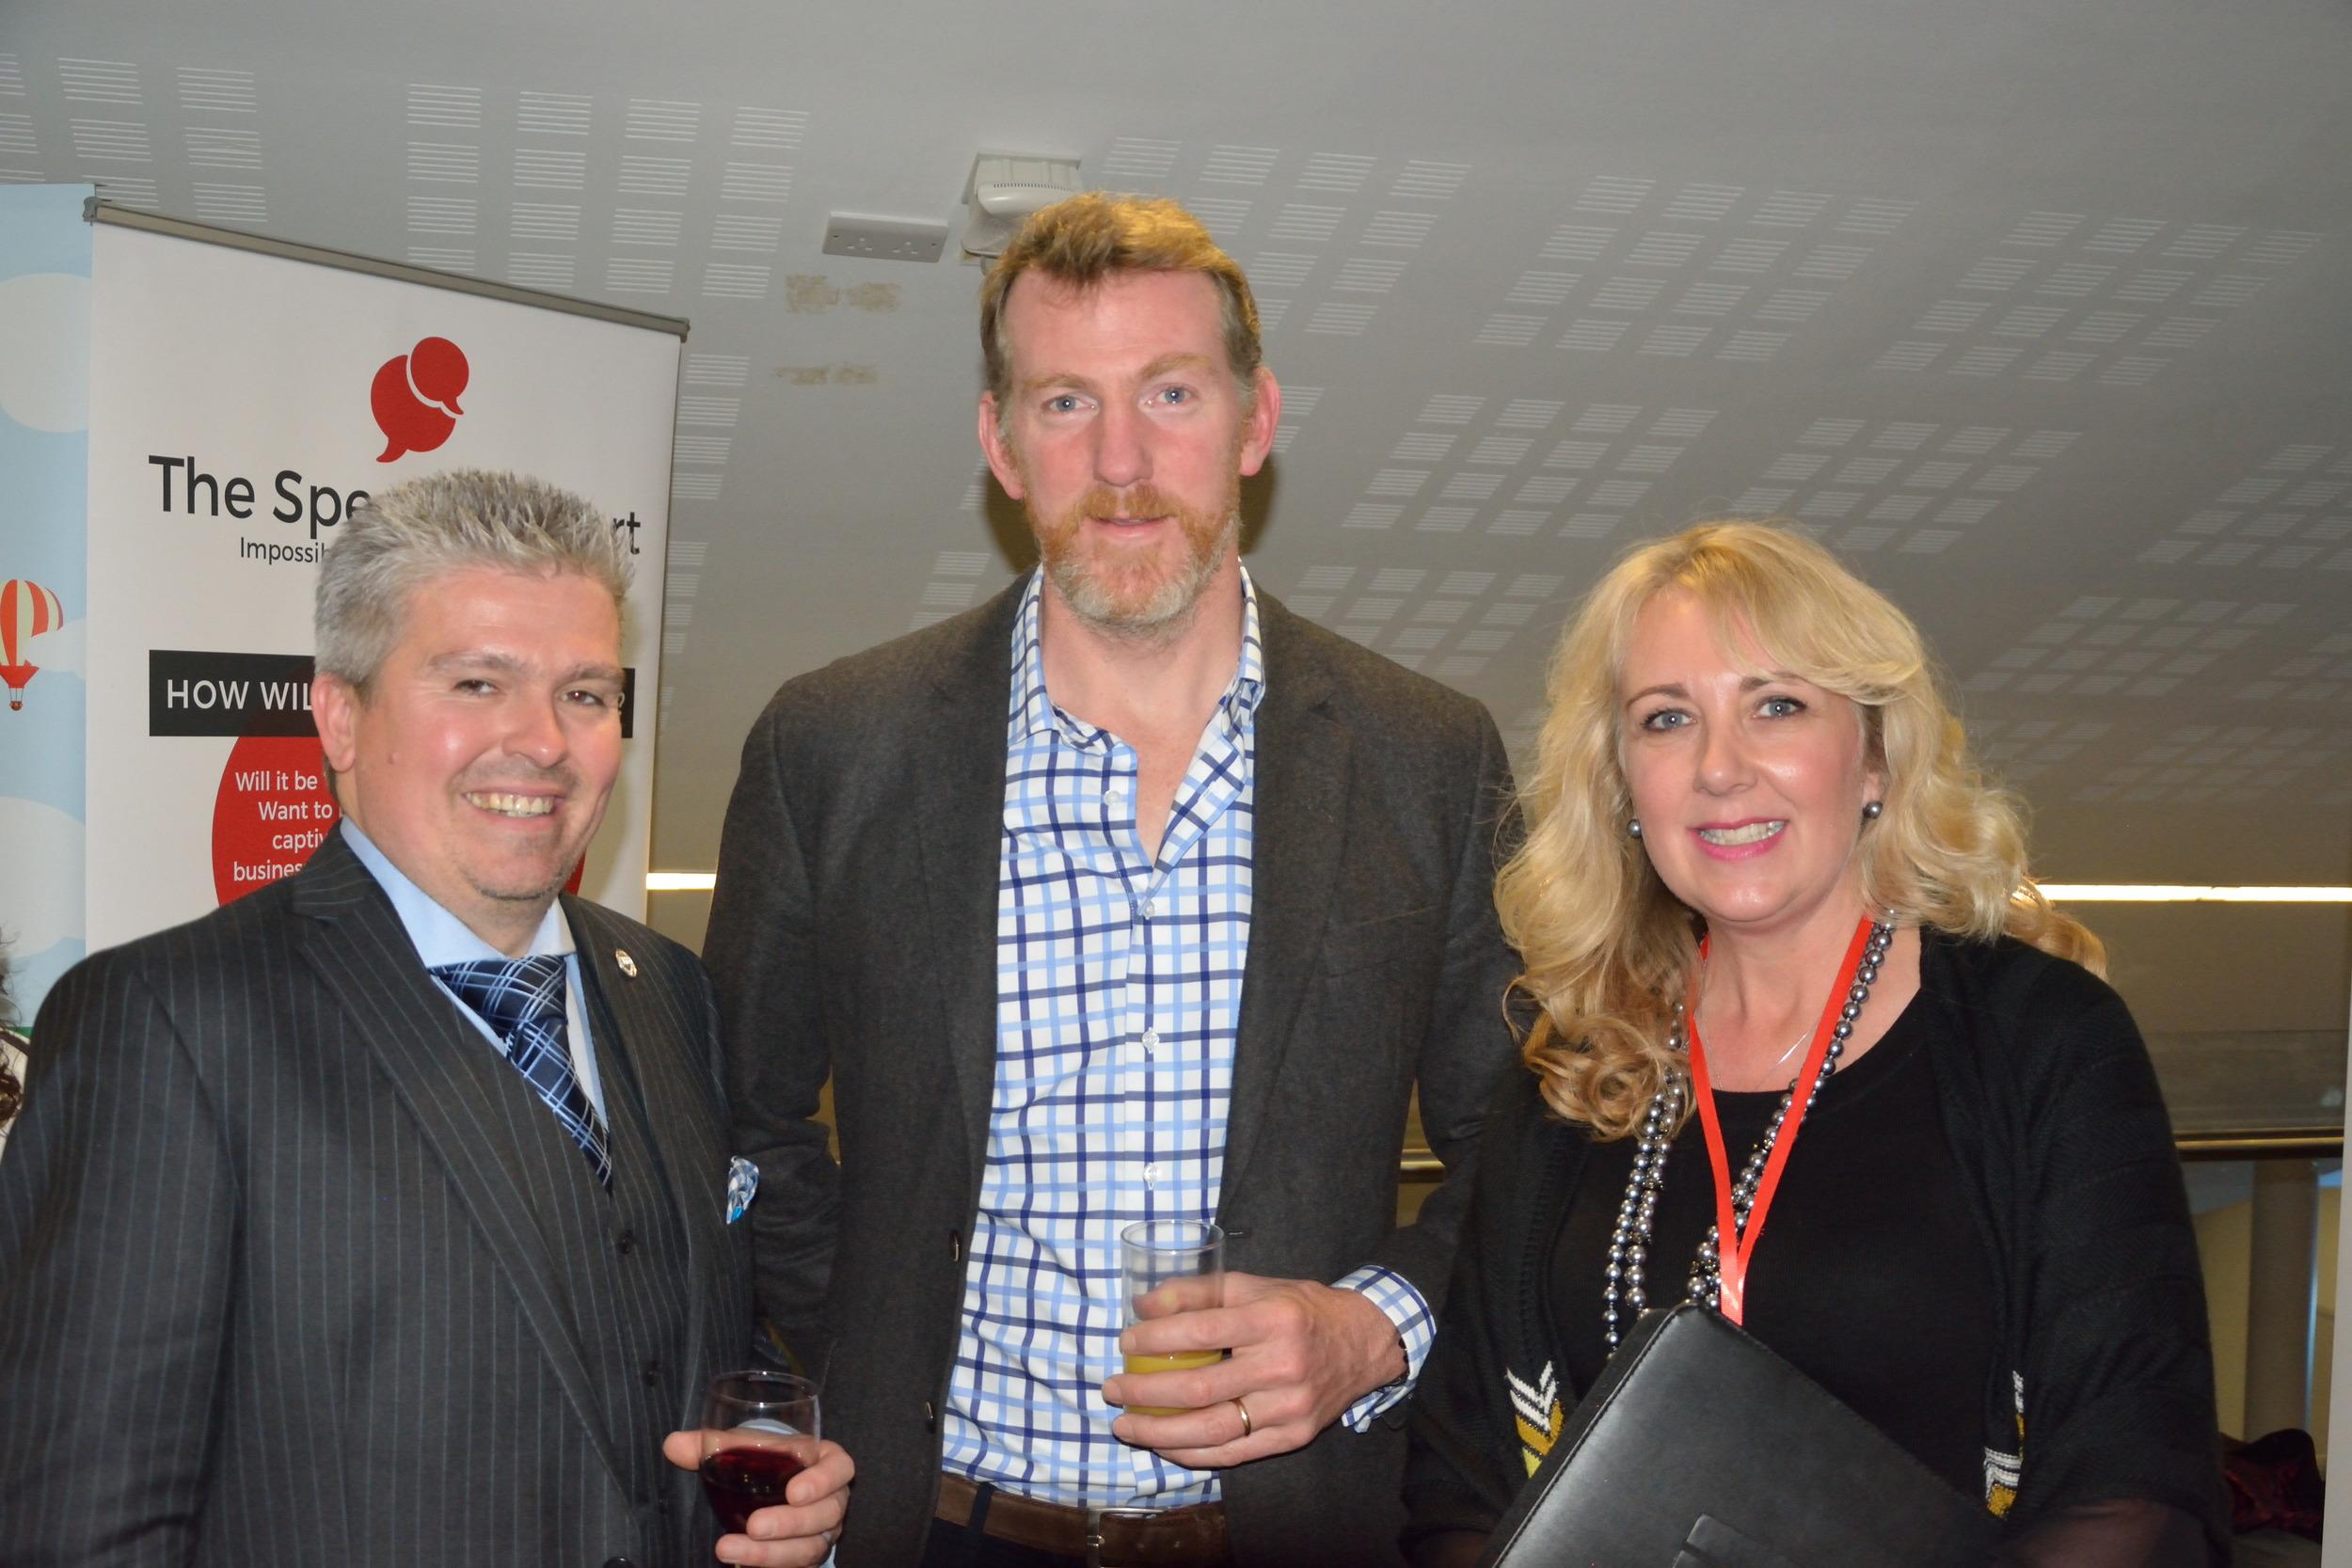 David Bell, Ben Hunt-Davis & Sarah Brockwell